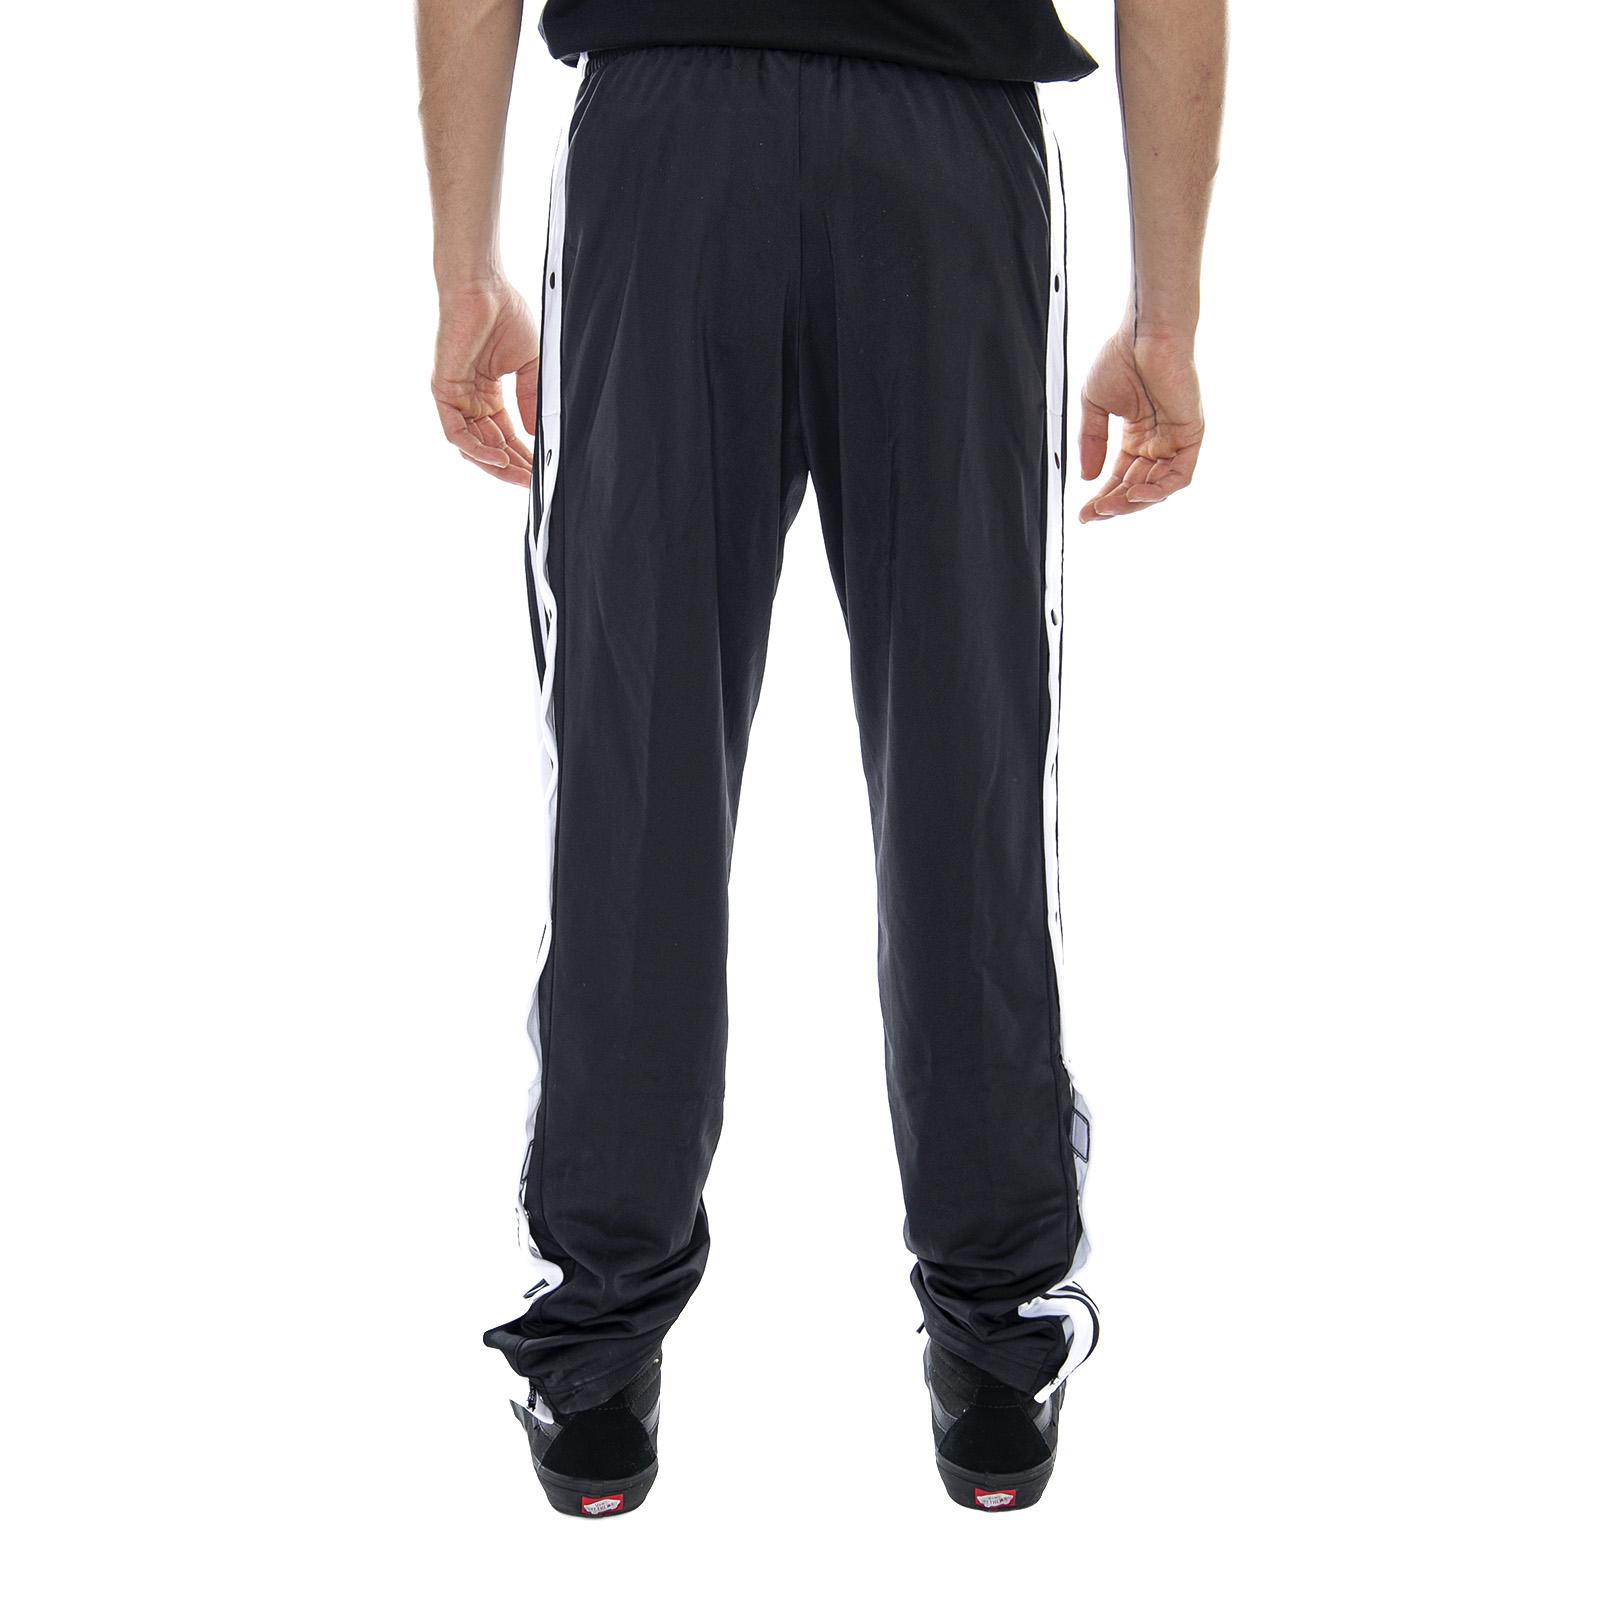 Pants Black Uomo Track Nero Adibreak Sportivi Adidas Pantaloni 8N0XnOkwP